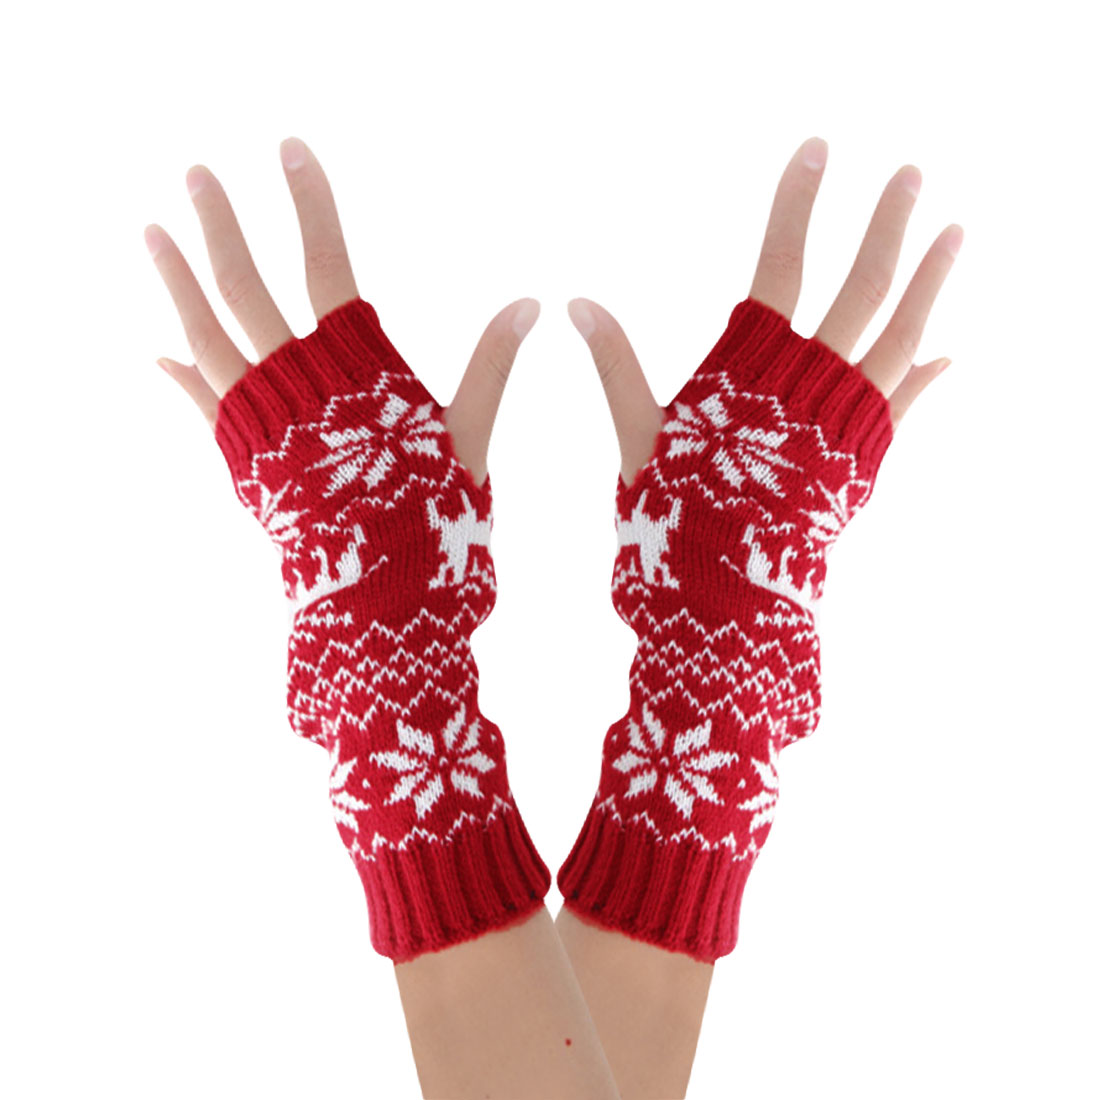 Tasharina Men's Xmas Cozy Deer Pattern Stretch Ribbed Trim Knitting Gloves Red